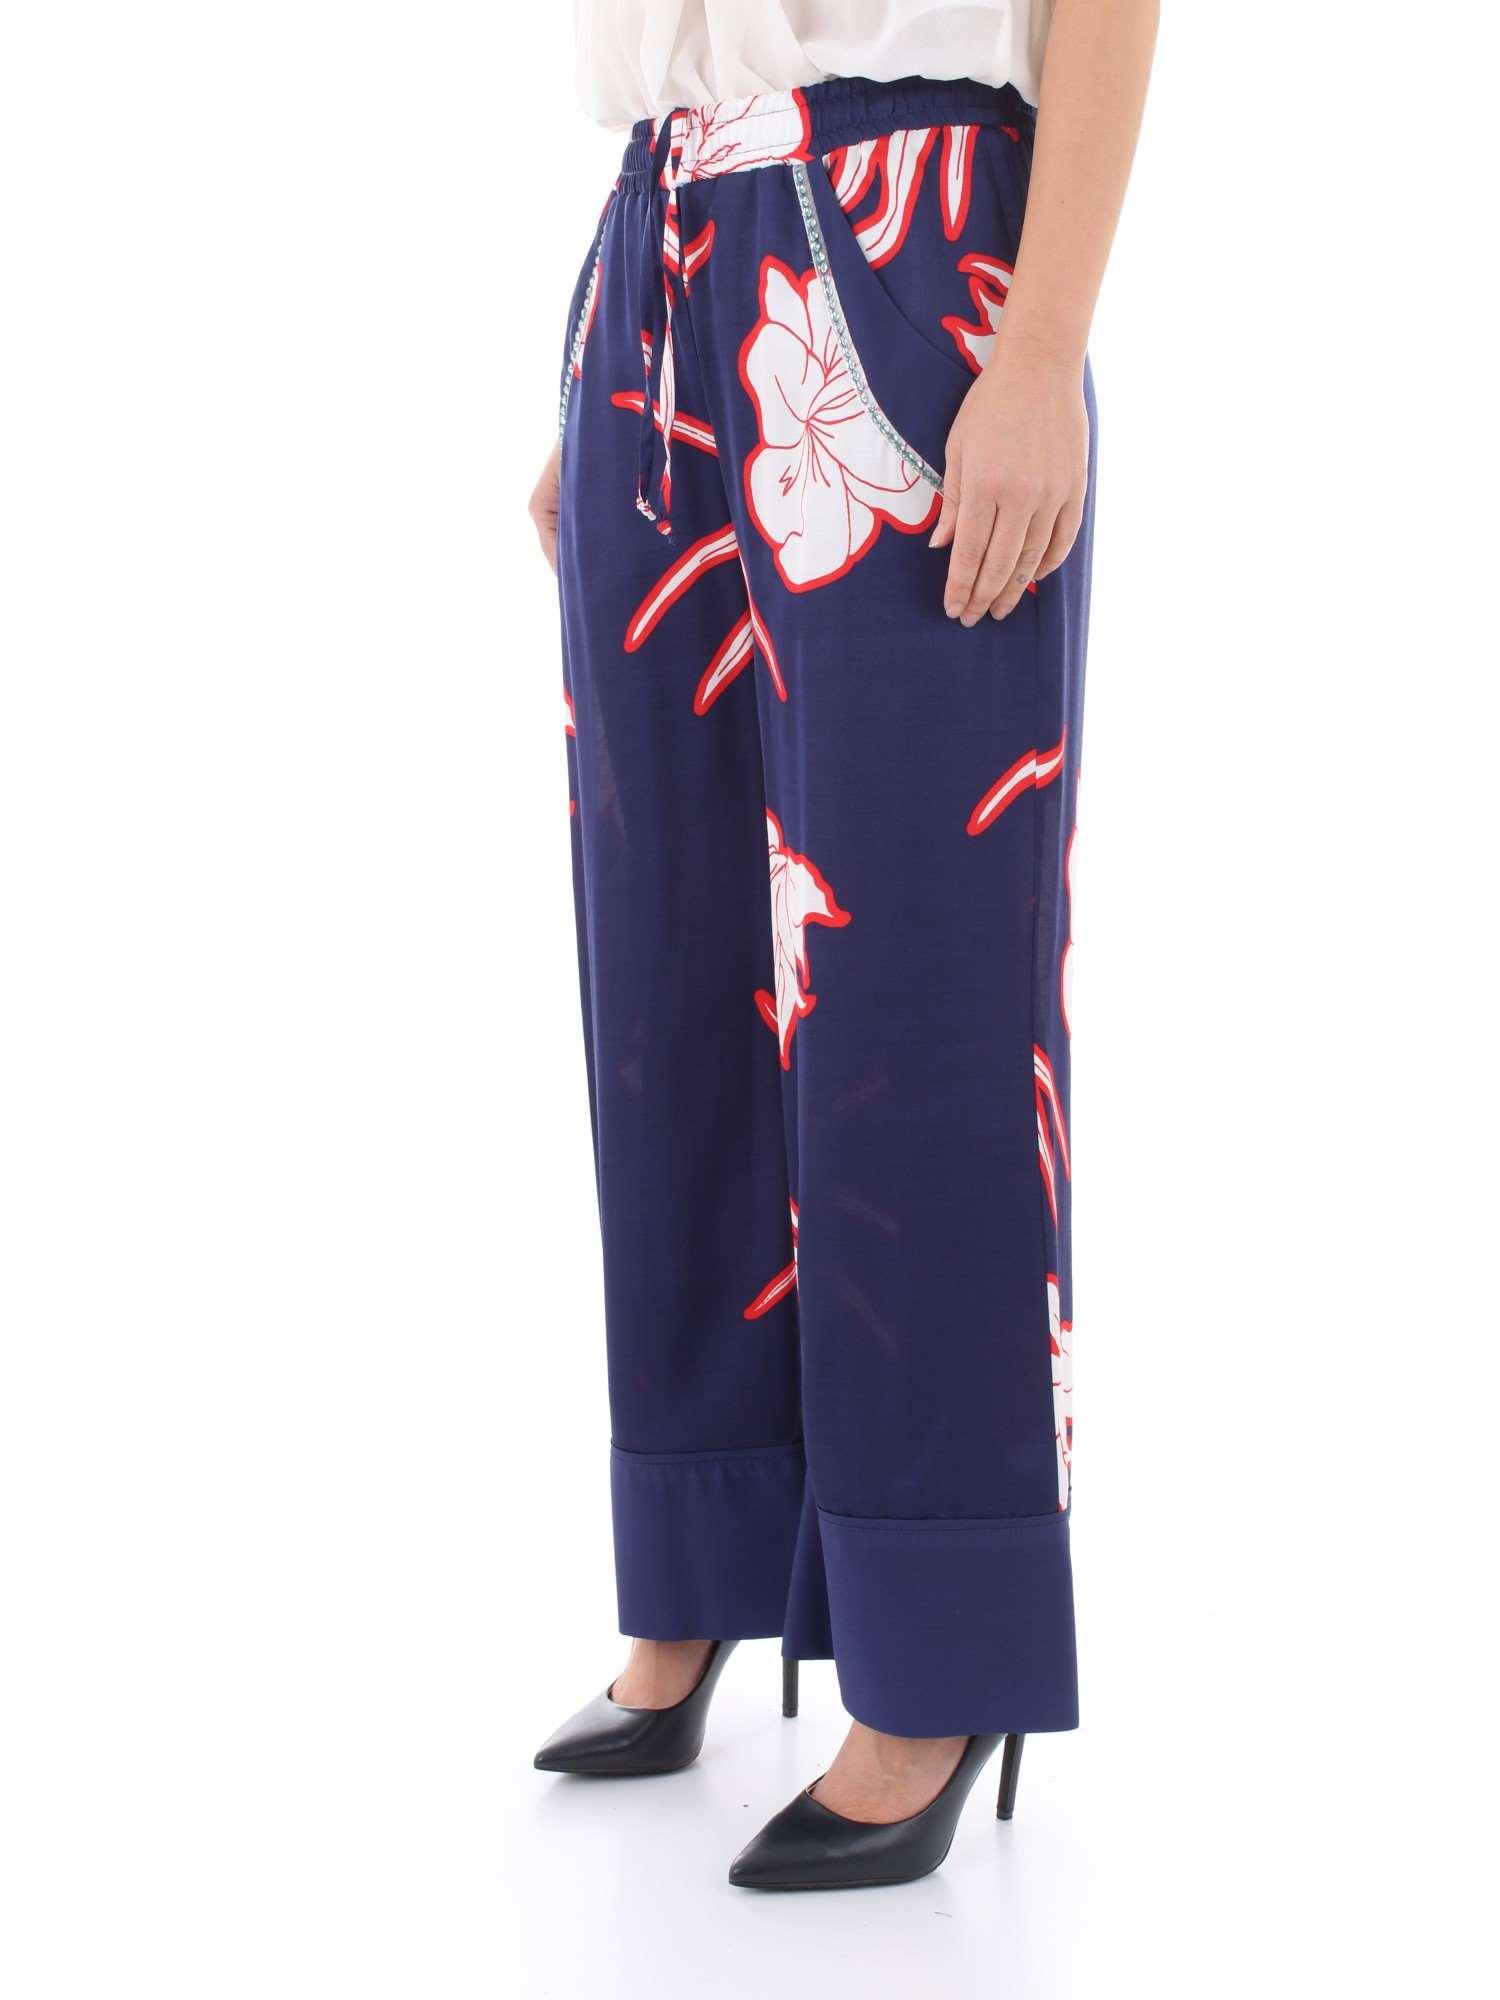 Pinko Pantaloni 1g13wd Blu er4 estate 7329 Dimagrante Donna Primavera fqfrxXS